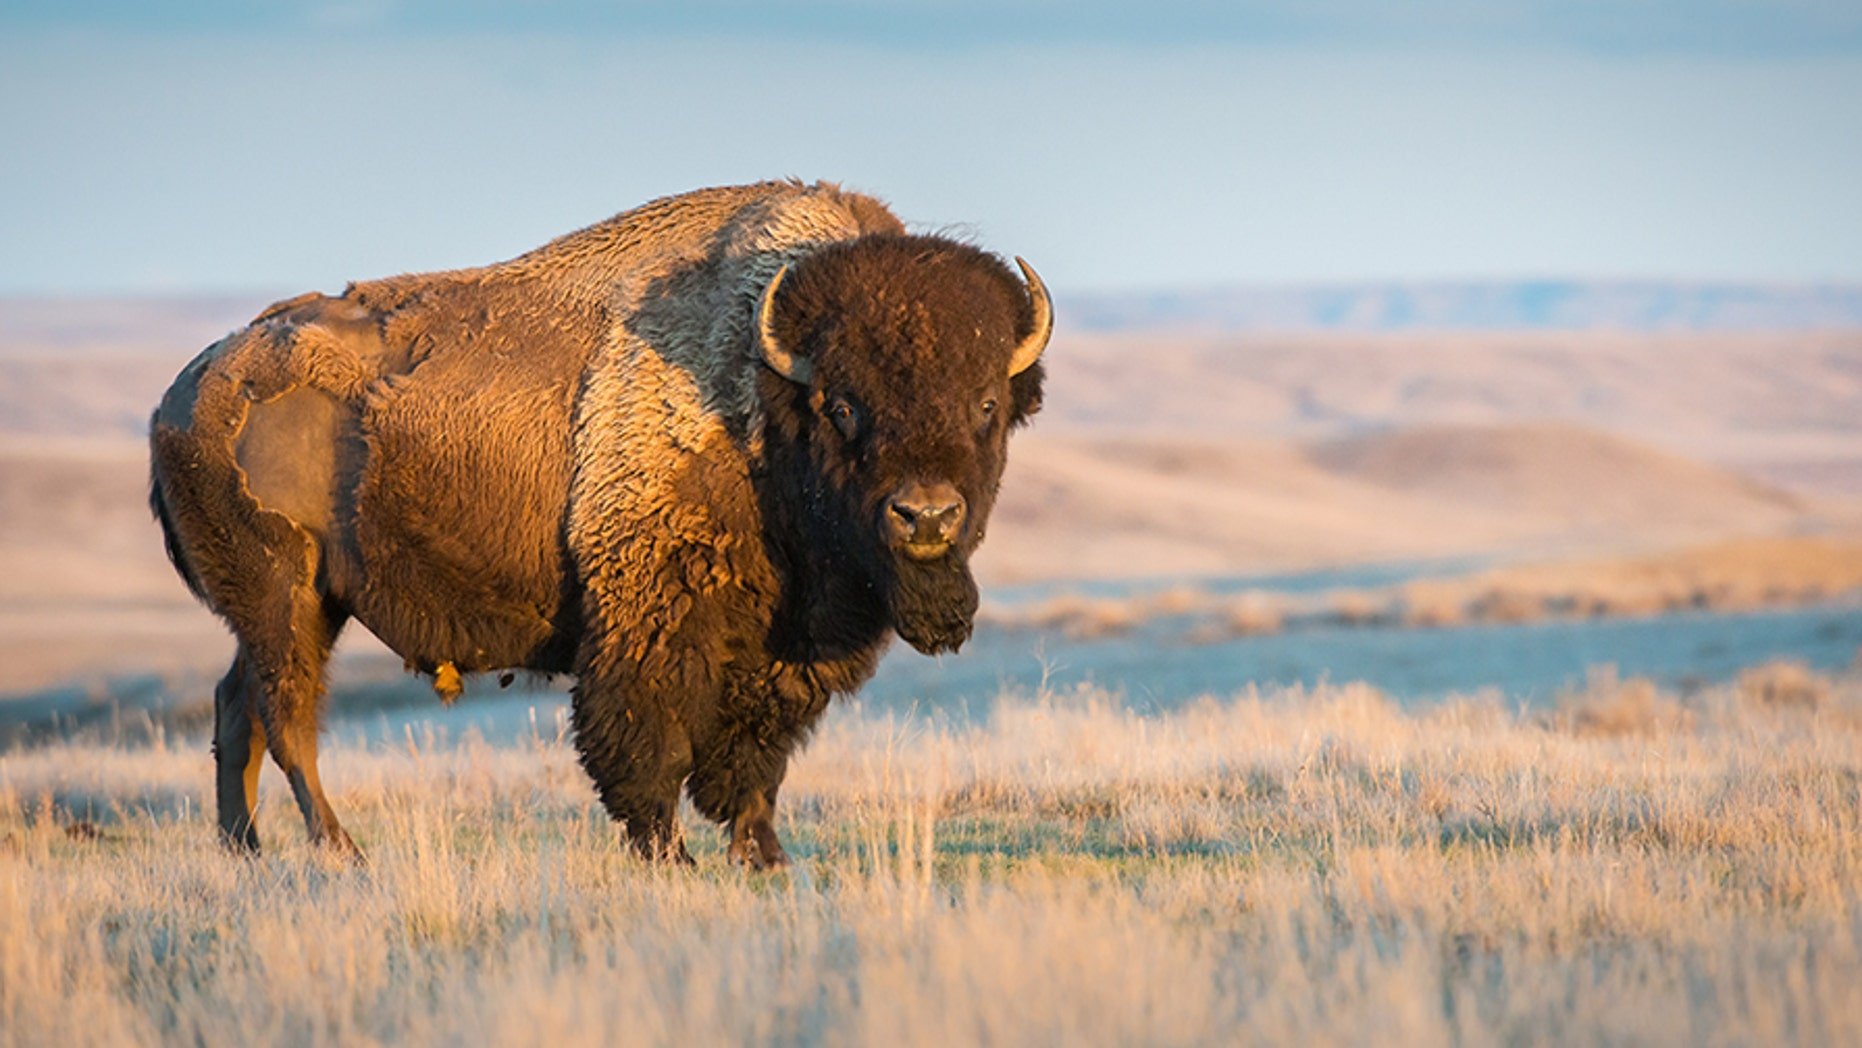 eebea39a54f A buffalo has gored a man camping in Southern California. Buffalo are  common and roam